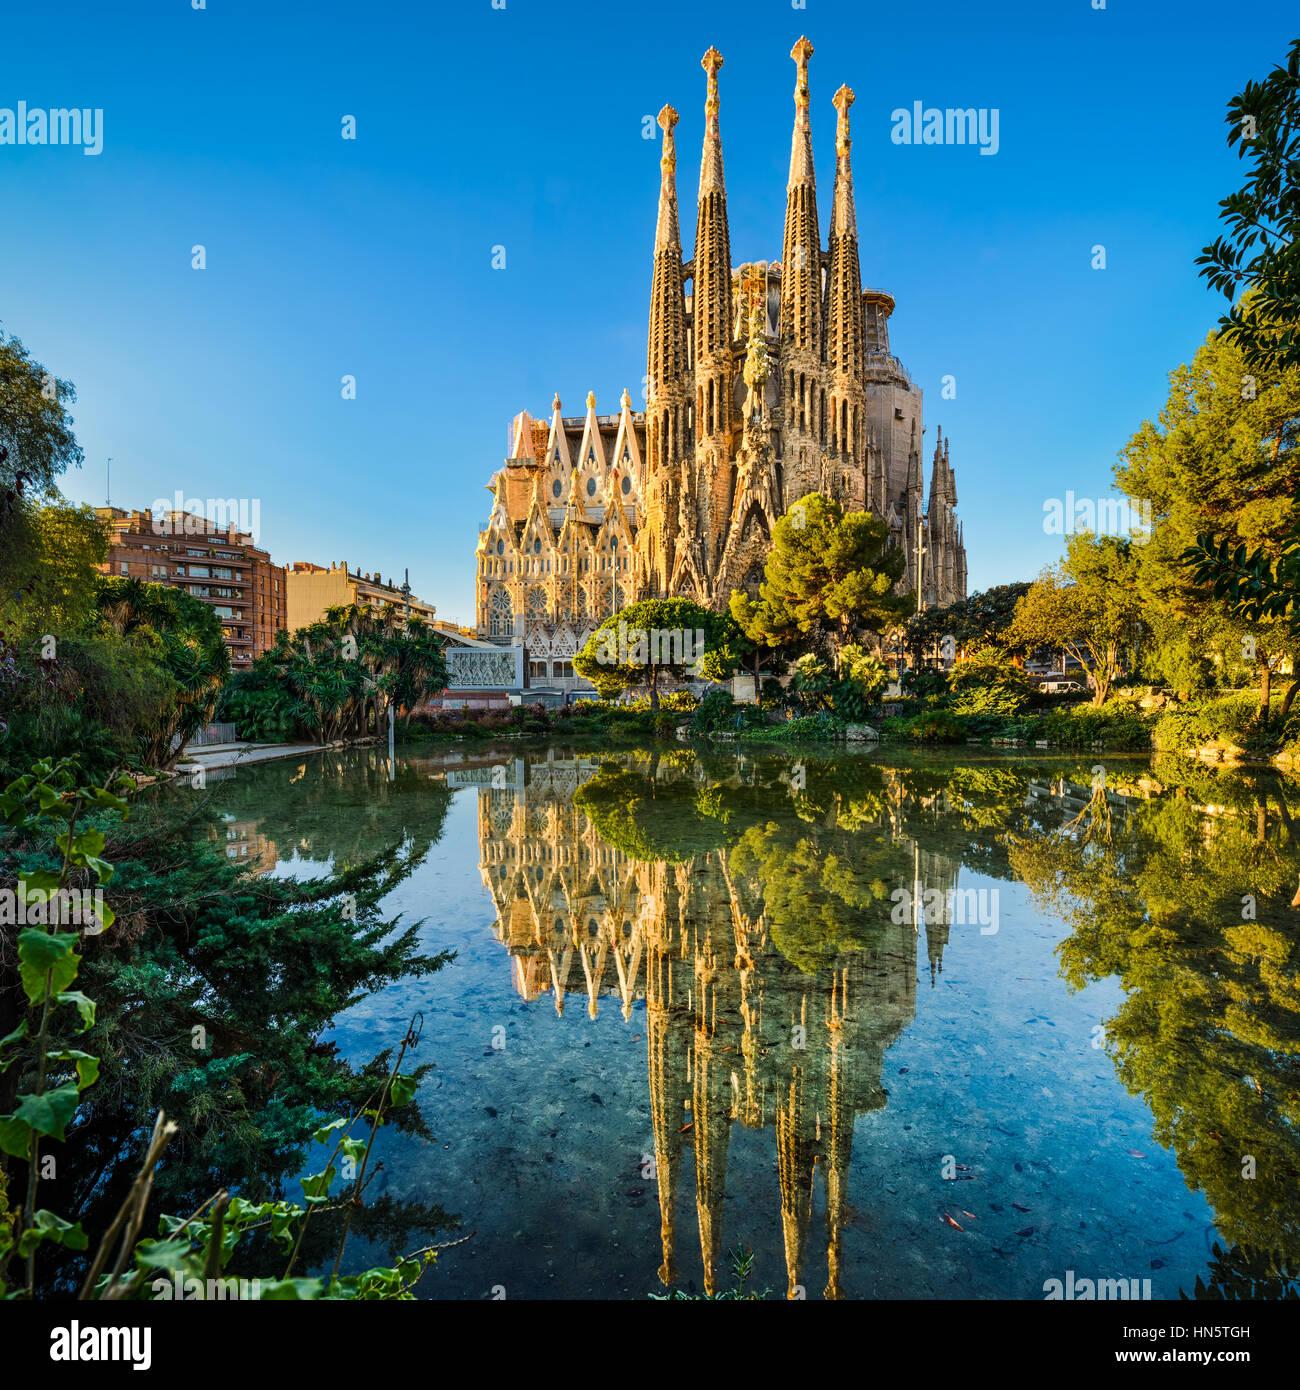 Sagrada Familia cathedral in Barcelona, Spain - Stock Image